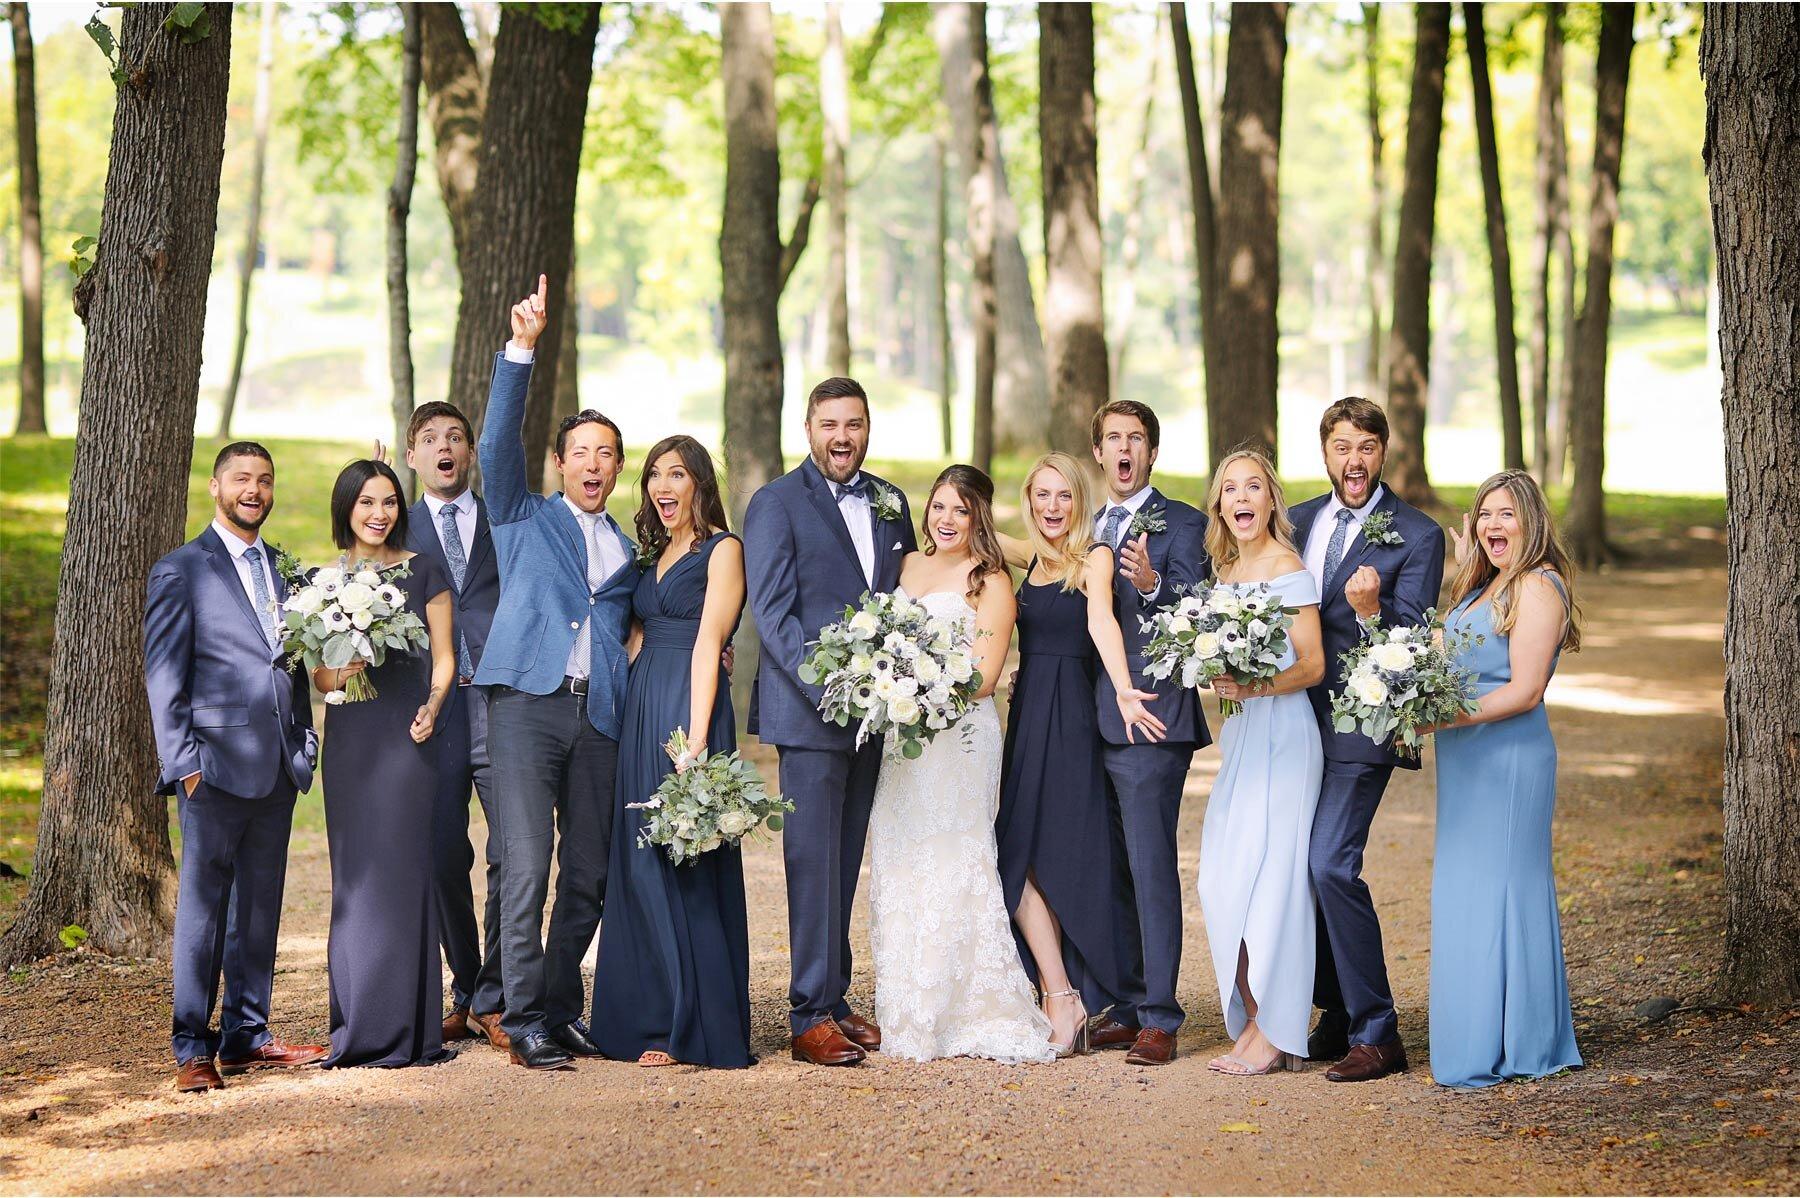 11-Vick-Photography-Wedding-Minnetonka-Minnesota-Lafayette-Club-Bridesmaids-Groomsmen-Katie-and-David.jpg